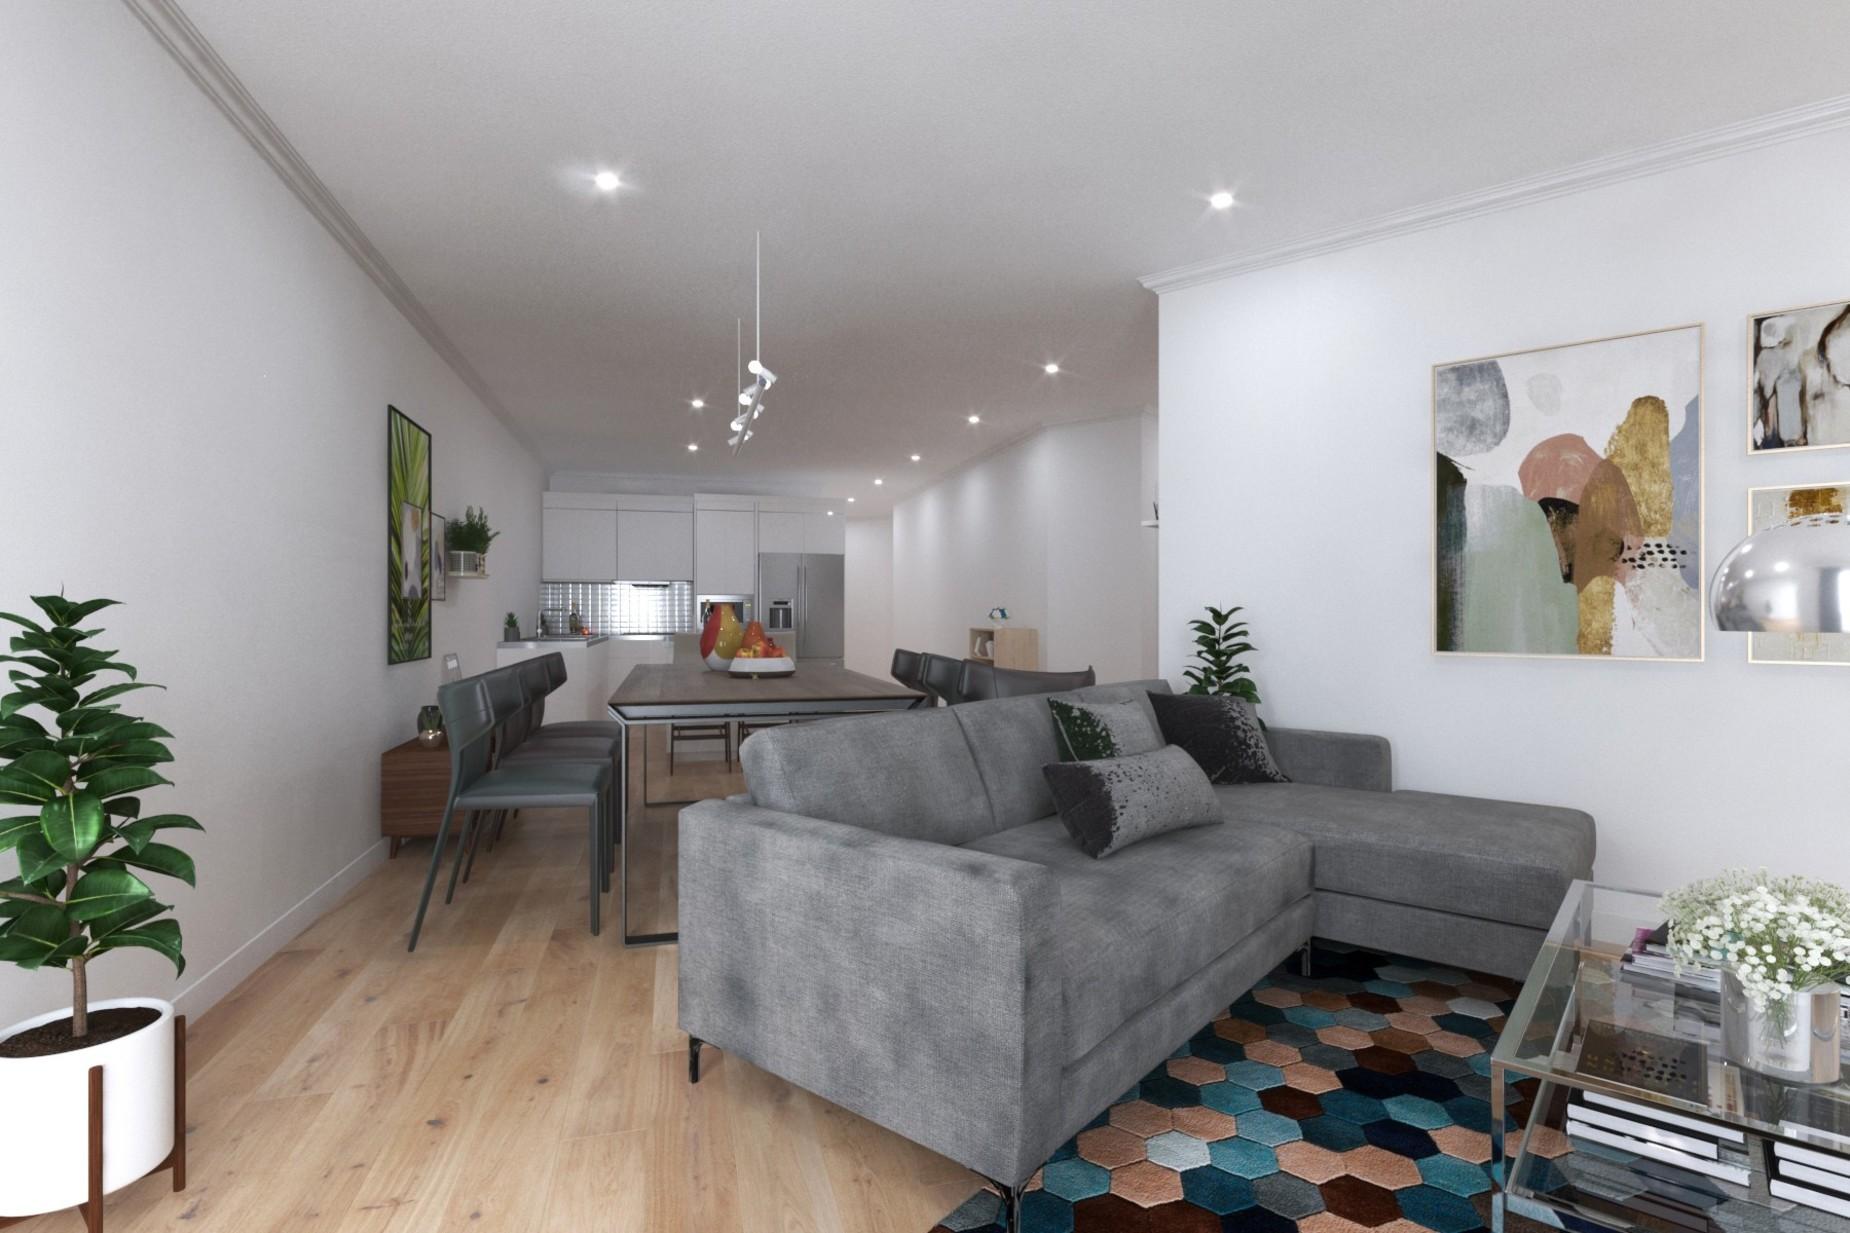 2 bed Penthouse For Sale in Birkirkara, Birkirkara - thumb 4